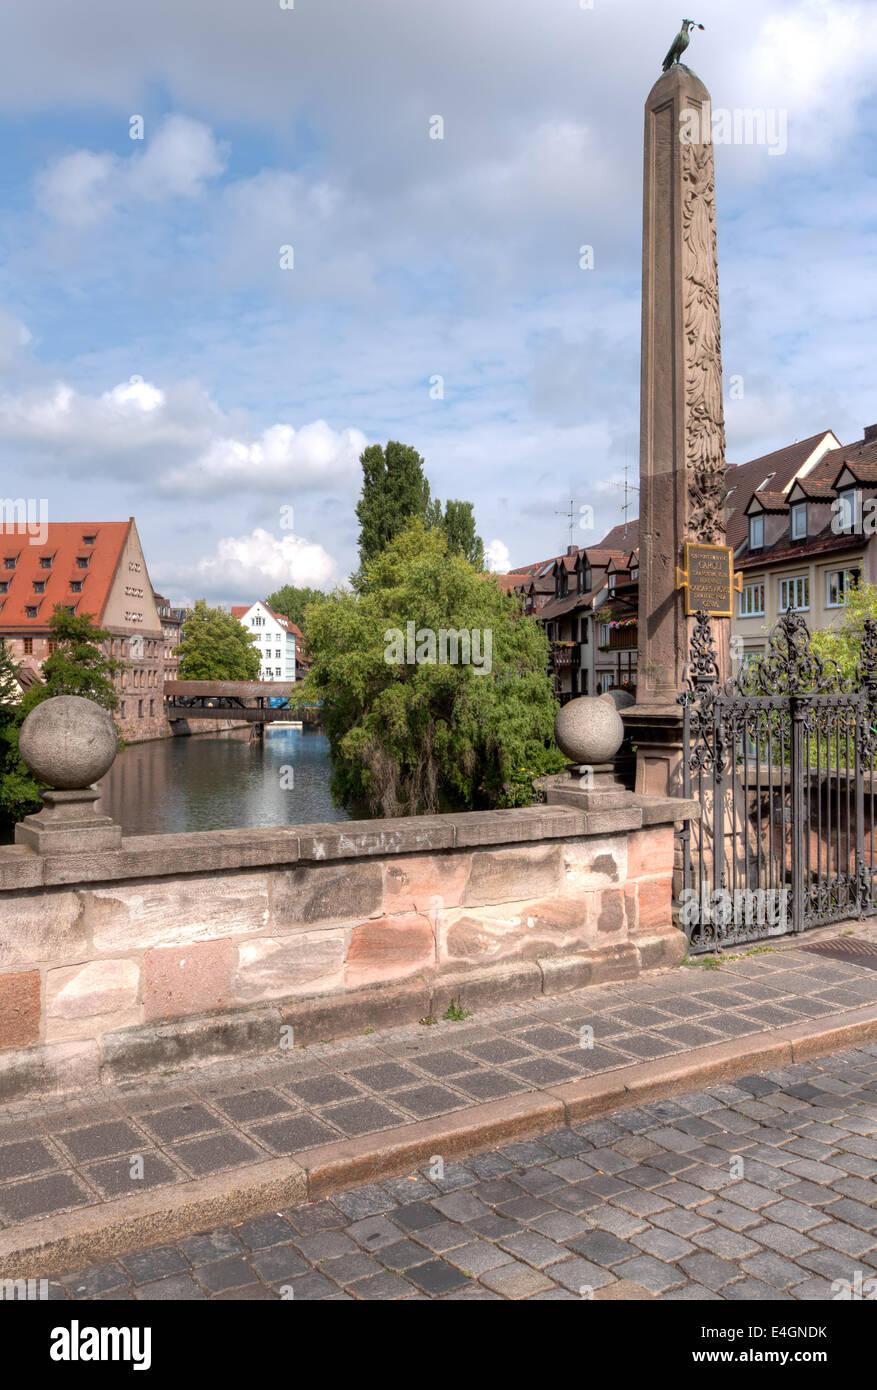 The ancient Karlsbruecke (Karls Bridge) looking towards the wooden Henkersteg (Hangman's Bridge) and the river Pegnitz Stock Photo